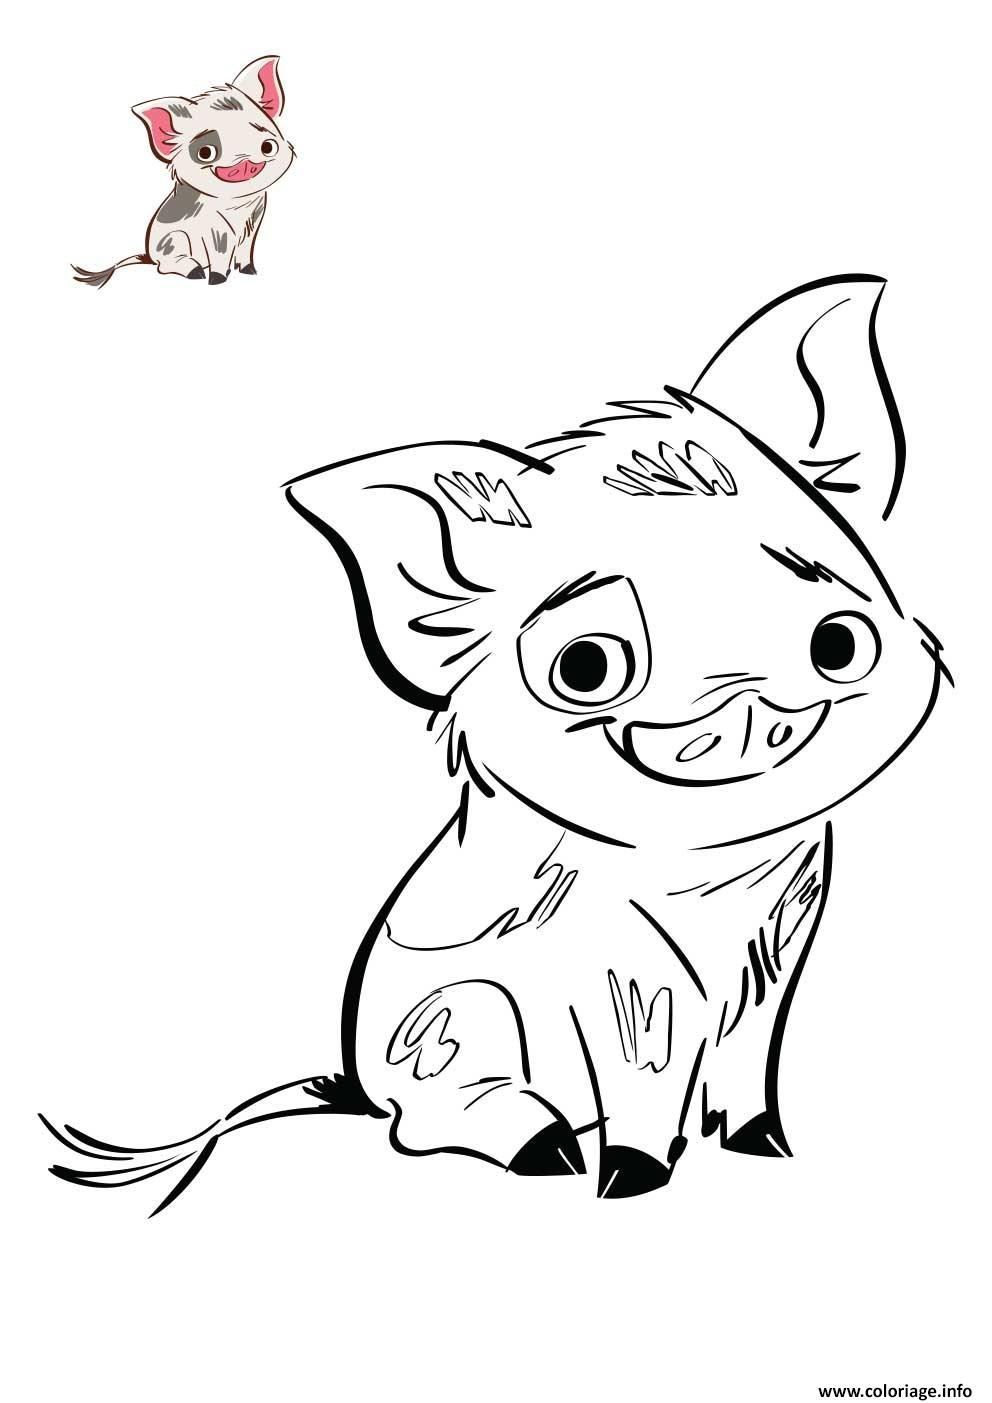 Coloriage Disney Vaiana A Imprimer Gratuit.Coloriage Le Petit Cochon De Vaiana Disney Dessin